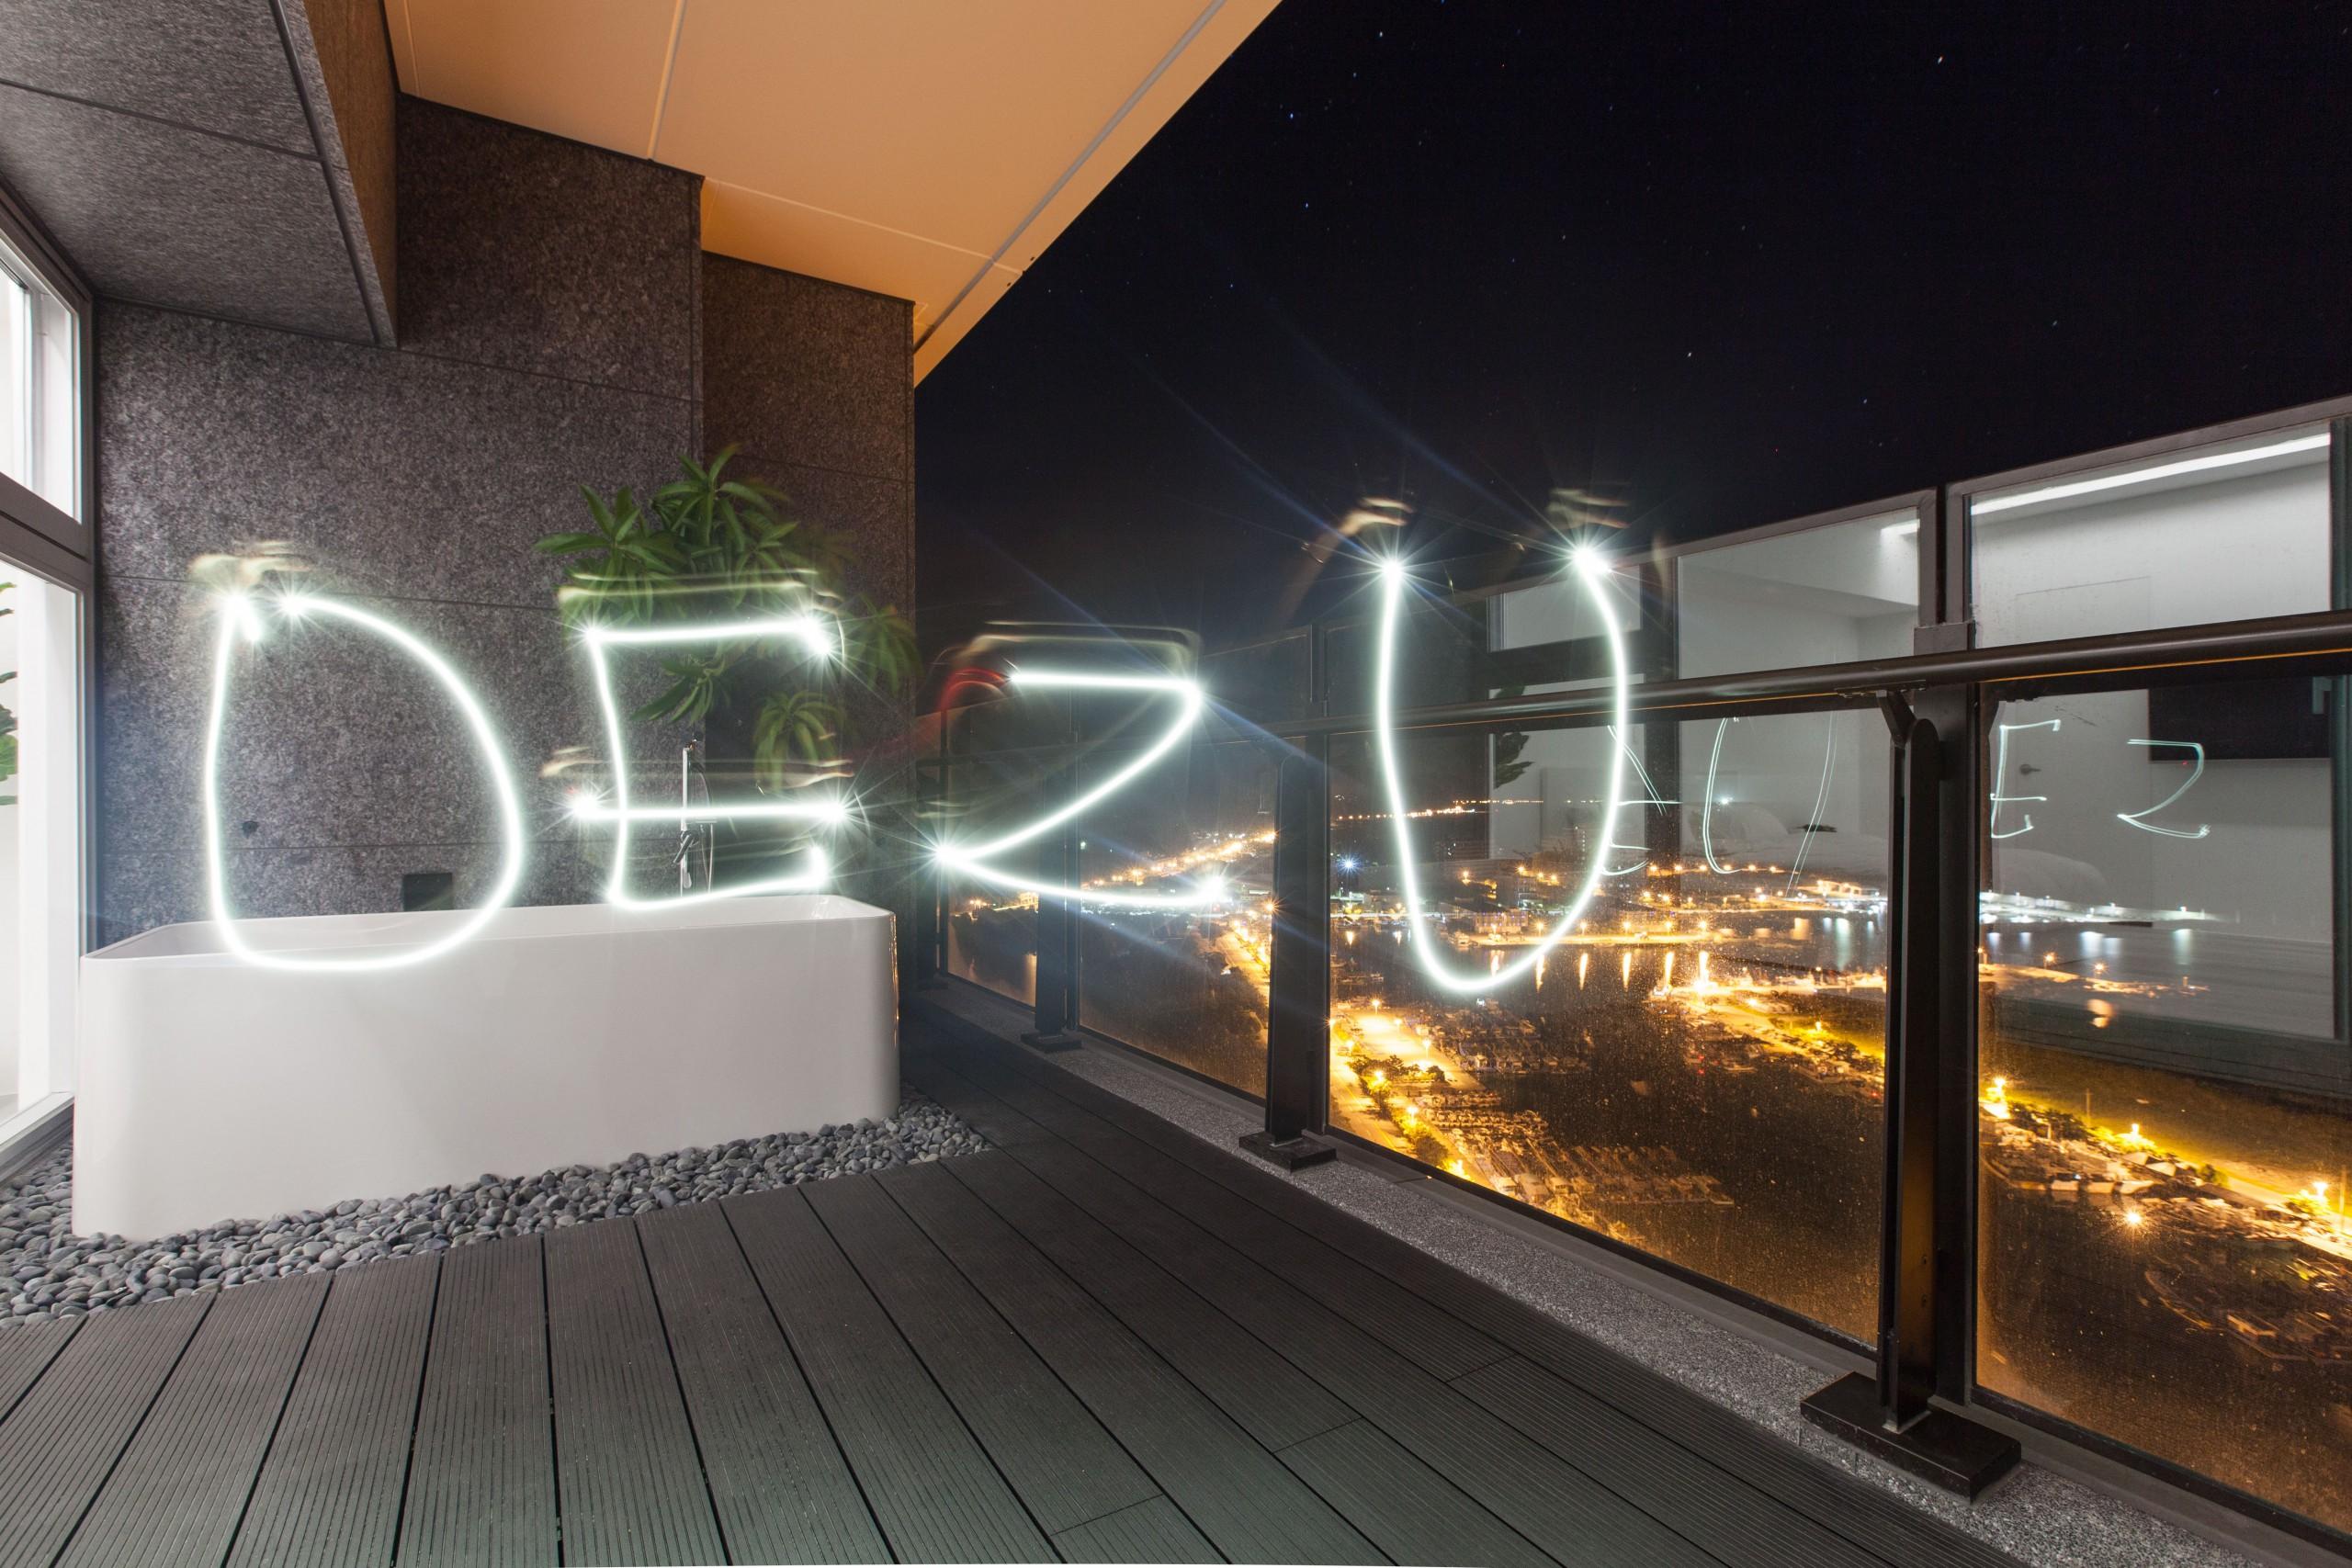 德築-DEZU-project-世界灣自宅裝修-architecture-interior-8